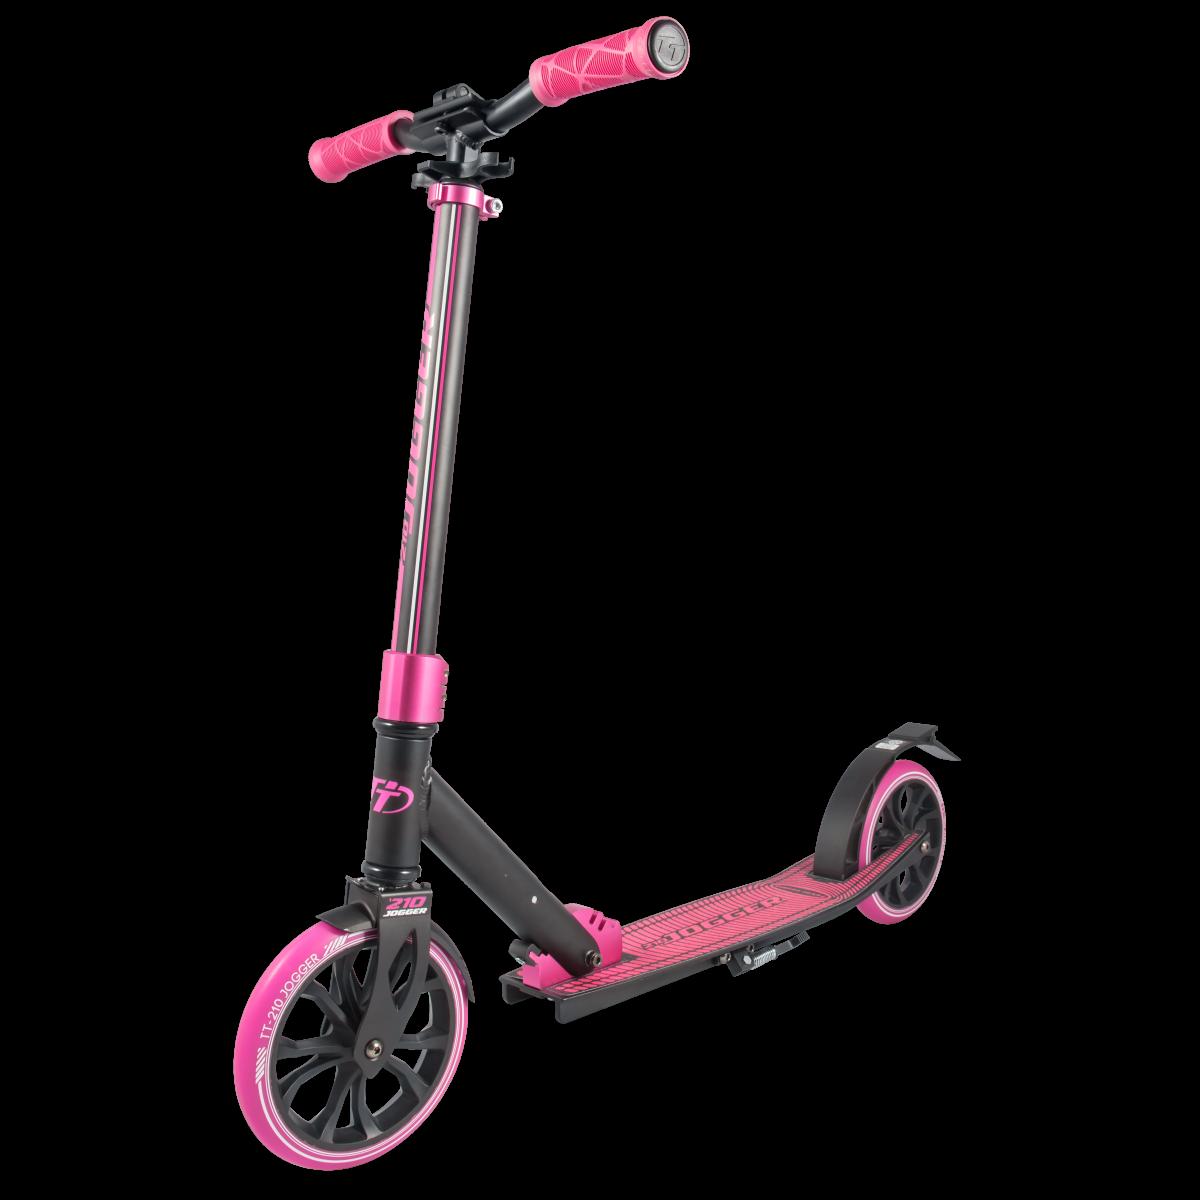 Самокат TechTeam Jogger 210 2019 розовый